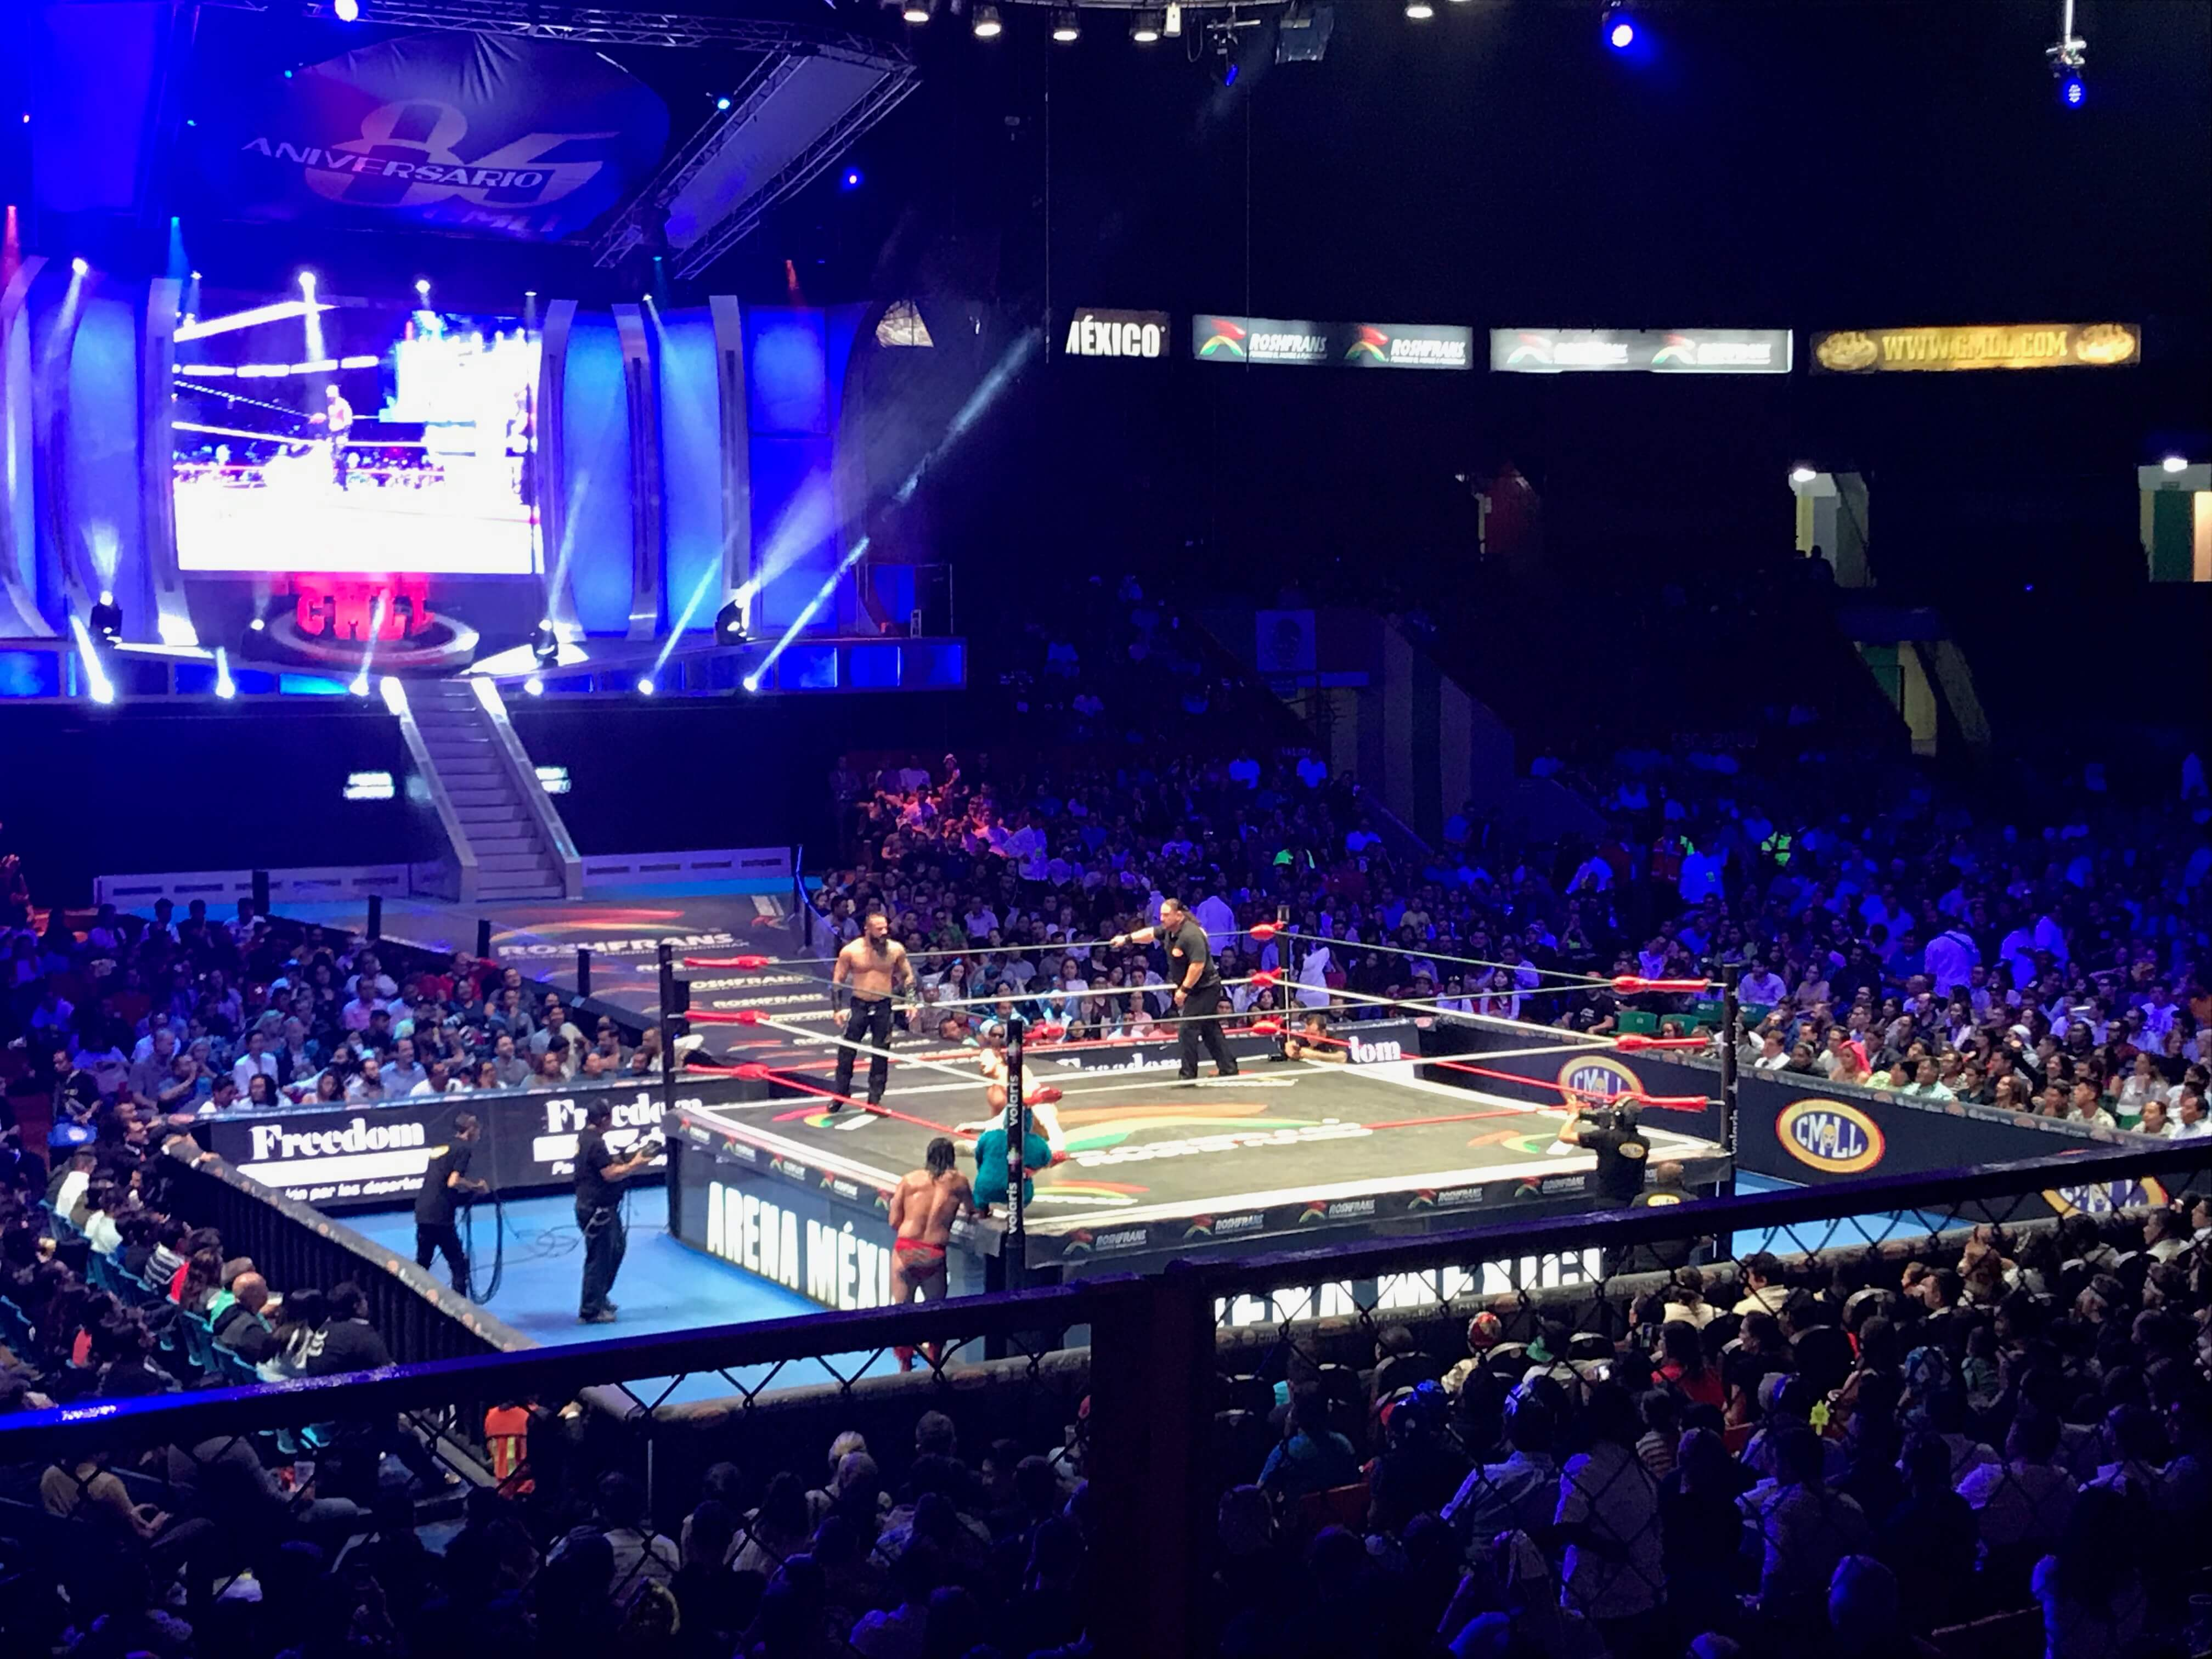 Lucha Libre  Wrestling in Mexico City